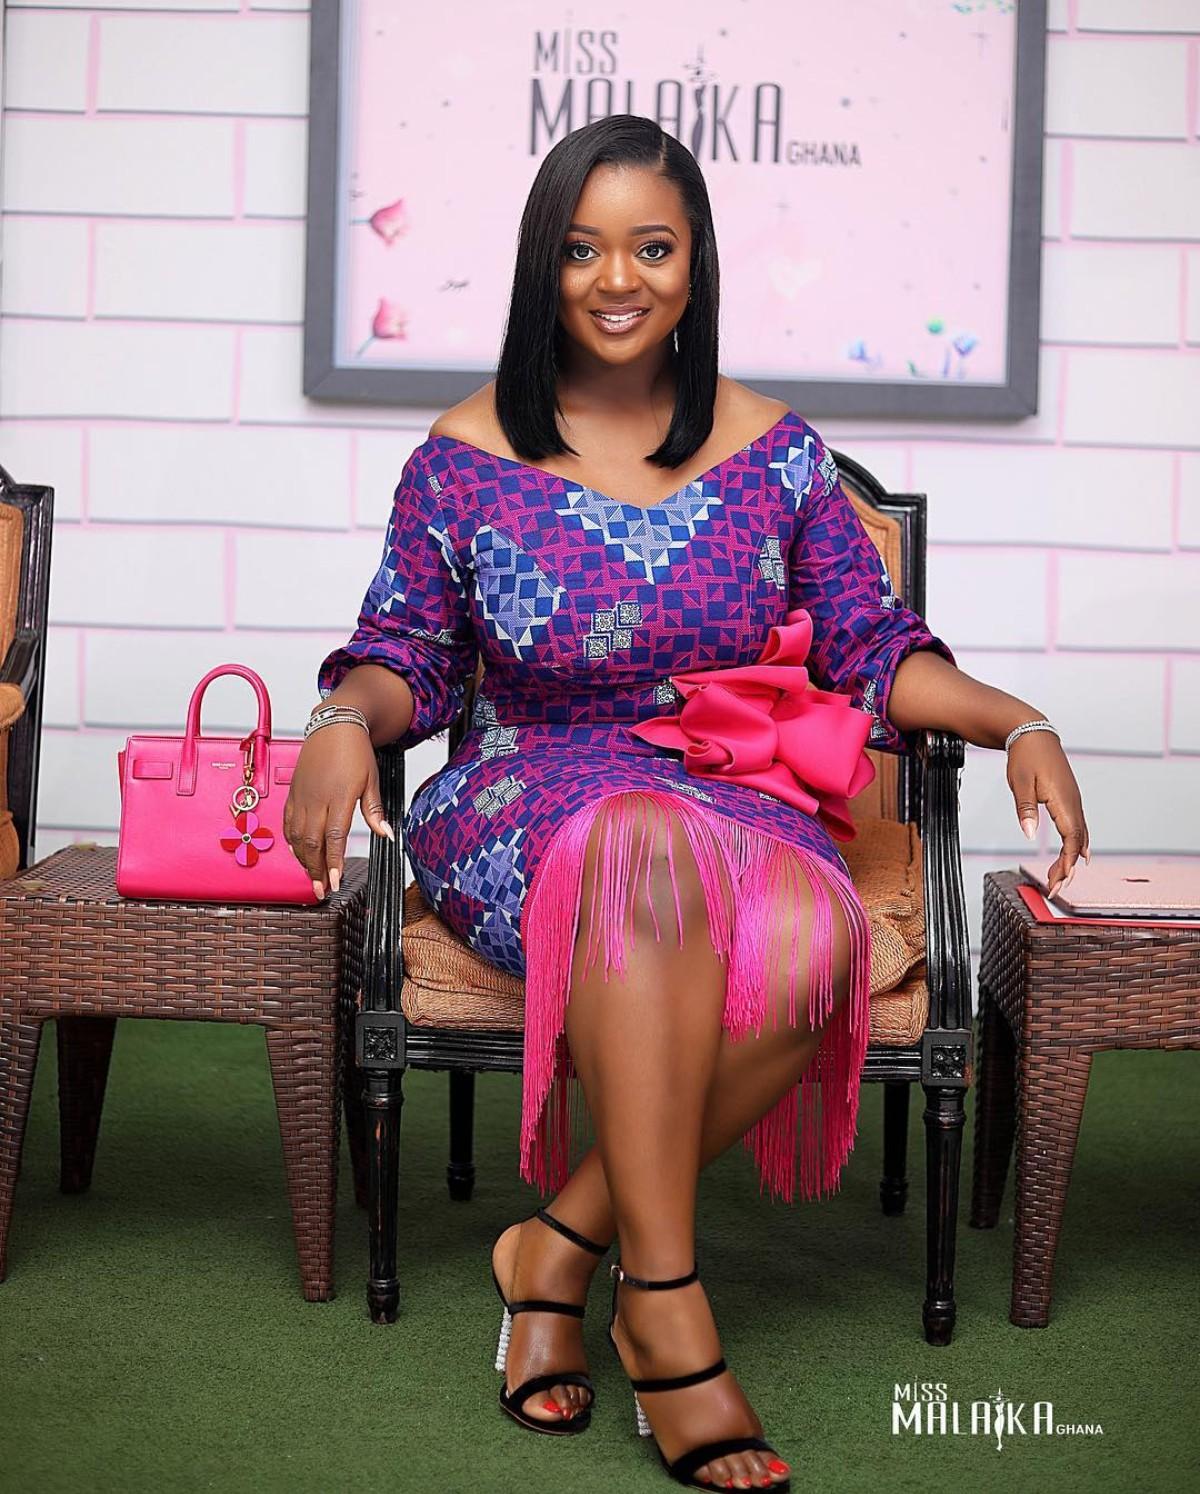 Jackie Appiah Miss Malaika Ghana